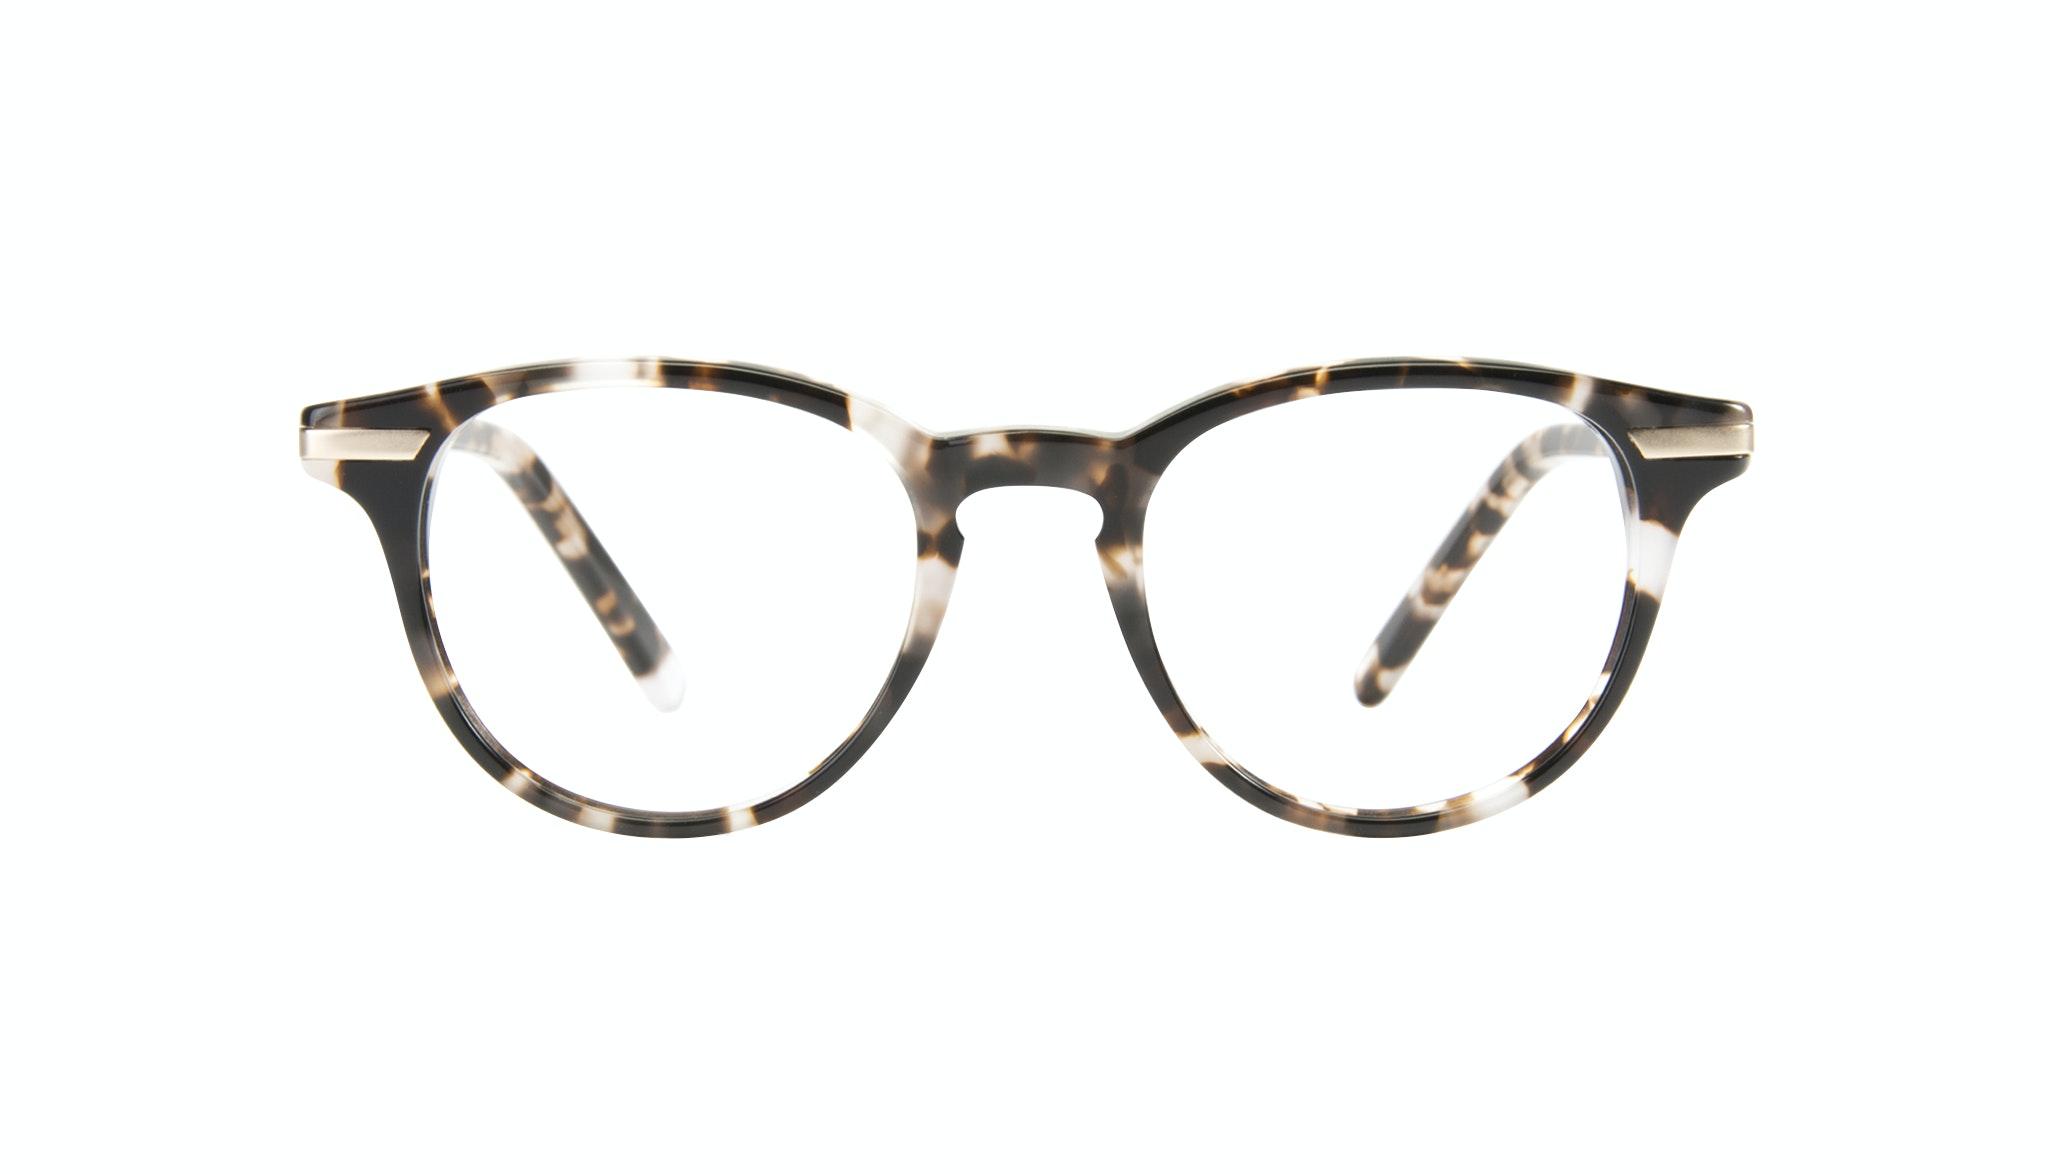 Affordable Fashion Glasses Round Eyeglasses Women Spark Mocha Tort